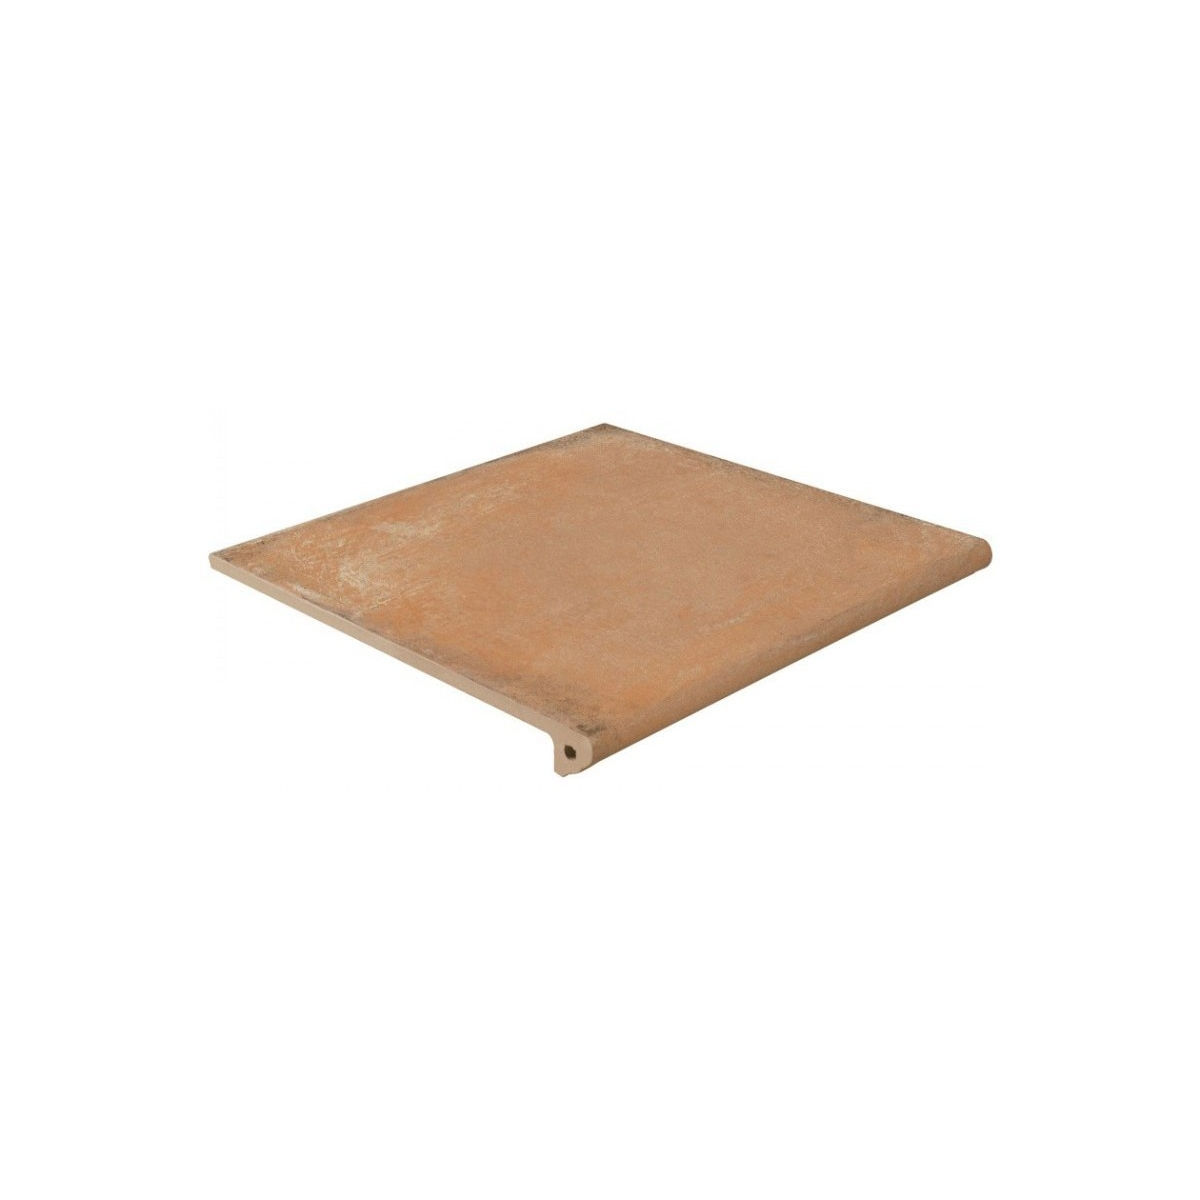 Alhamar peldaño 33 x 33 x 3 cm